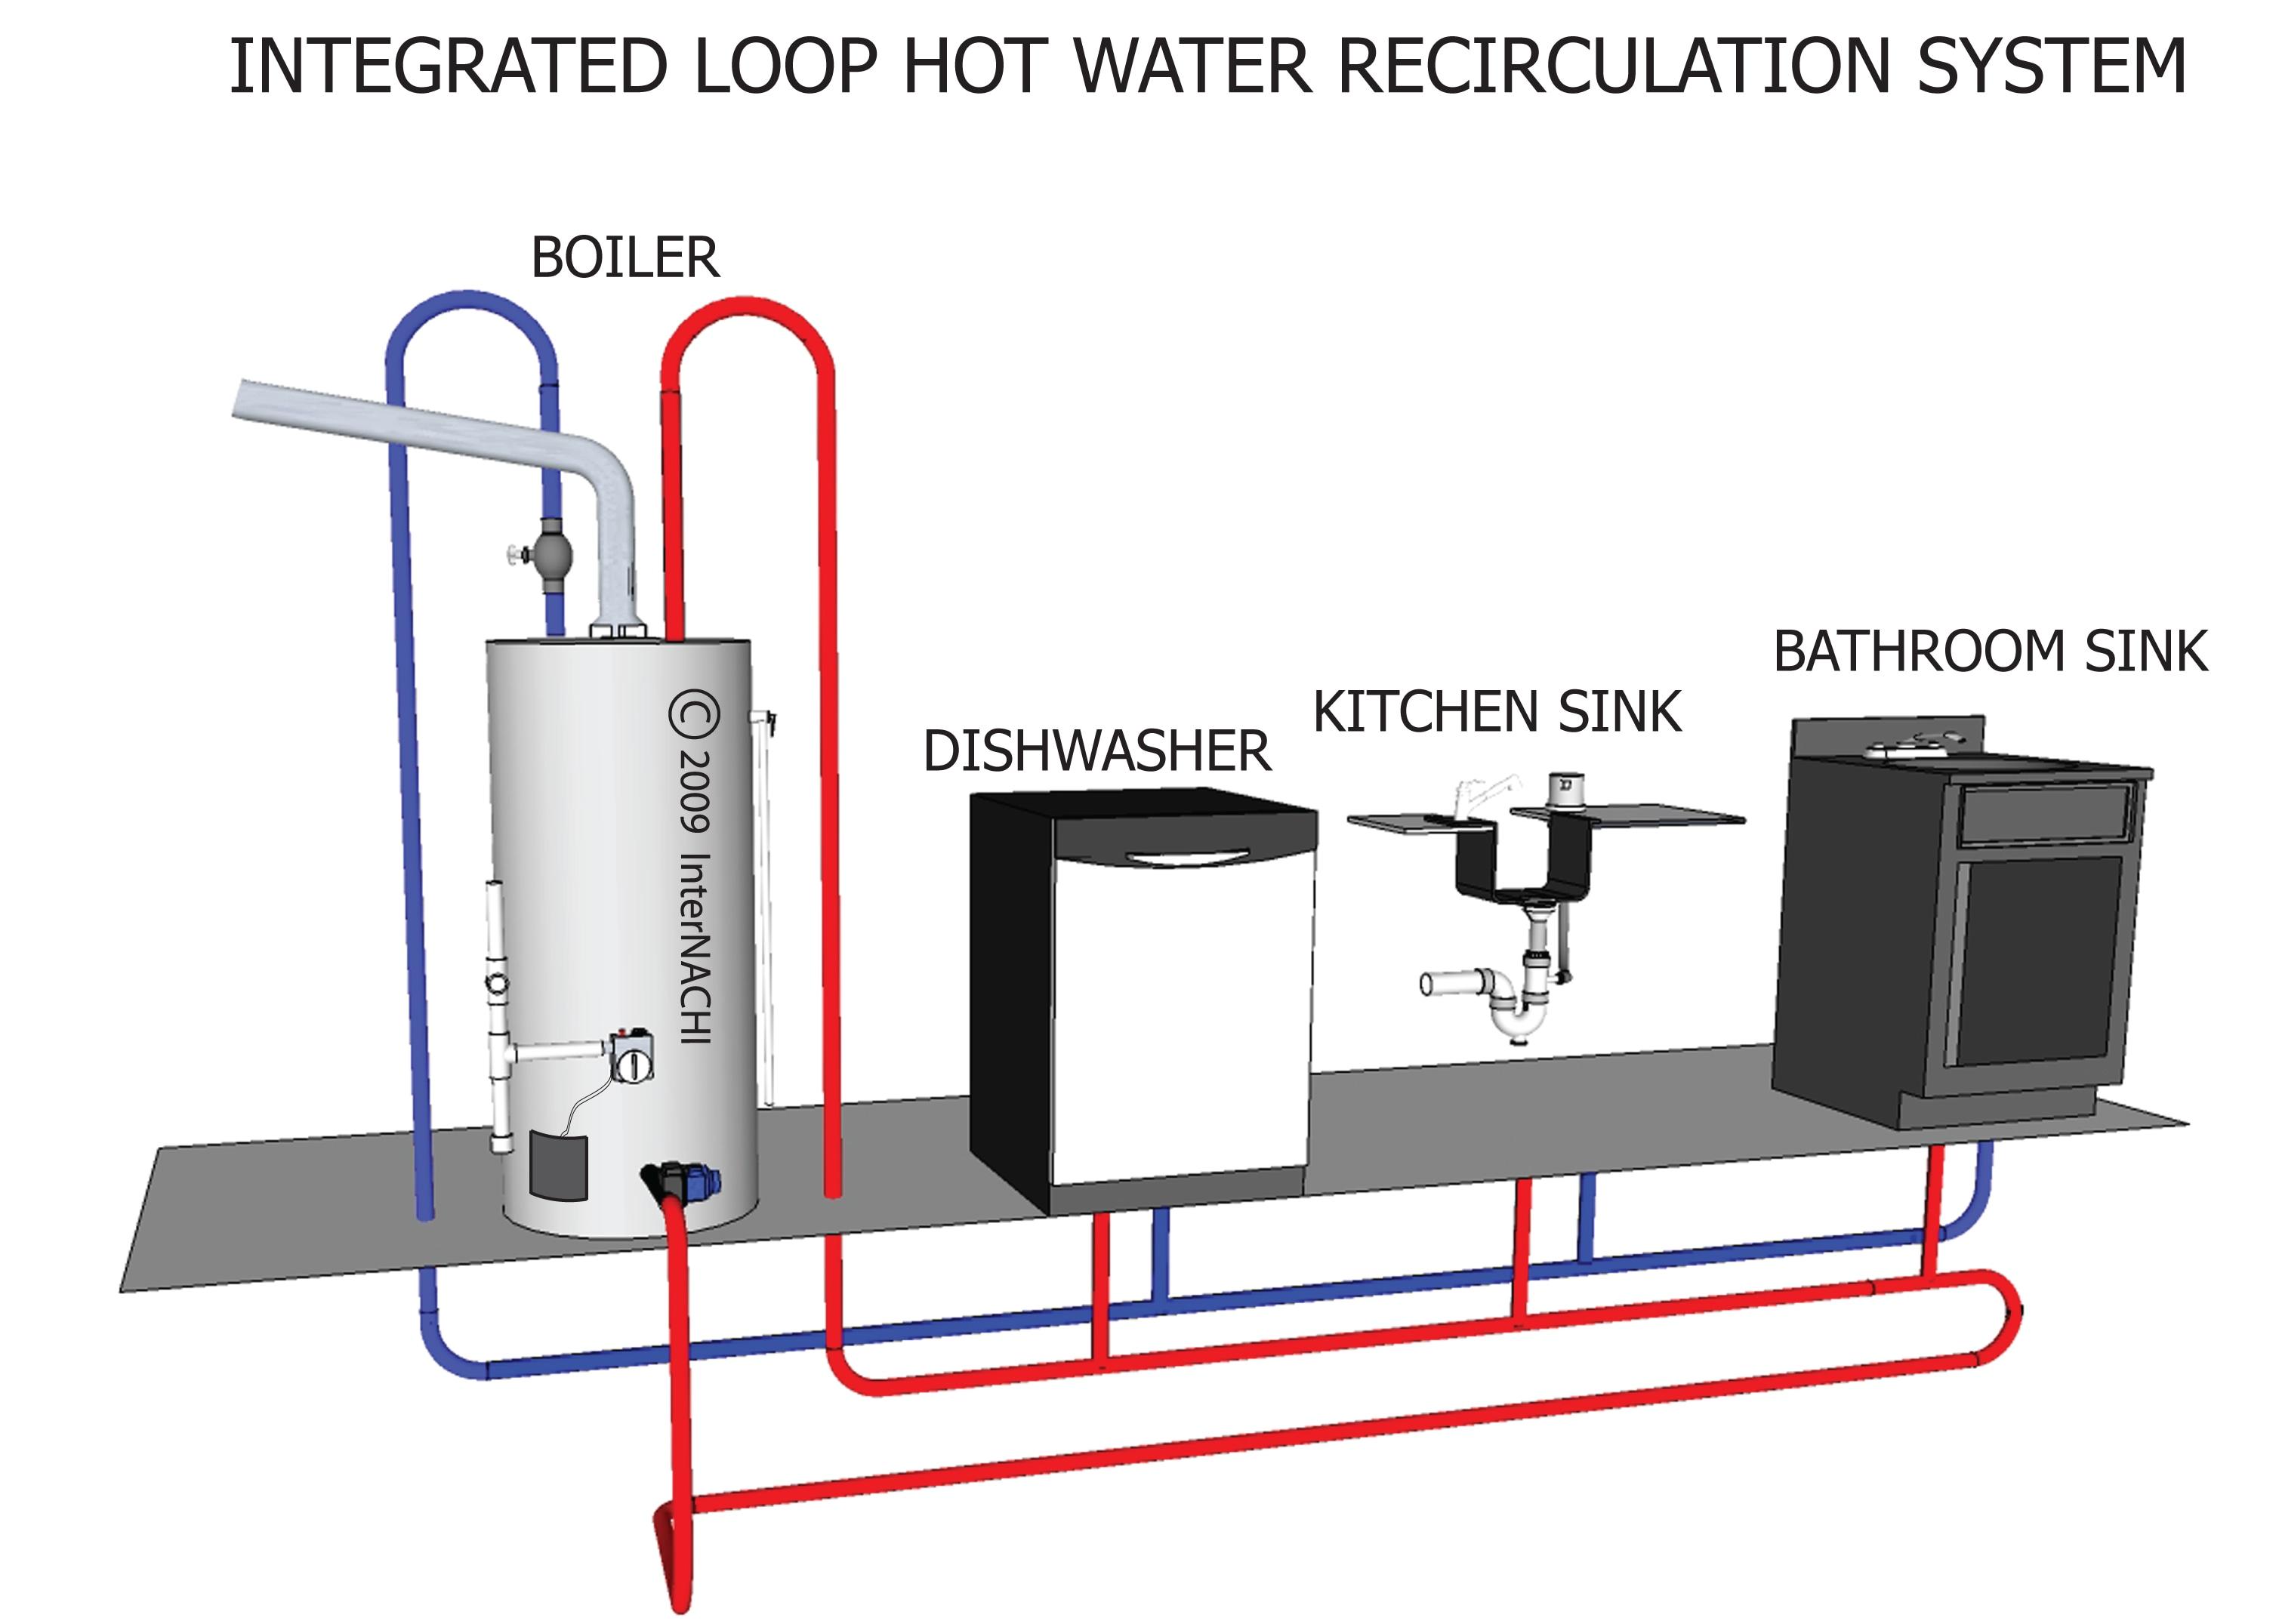 Integrated loop, hot water recirculation system.